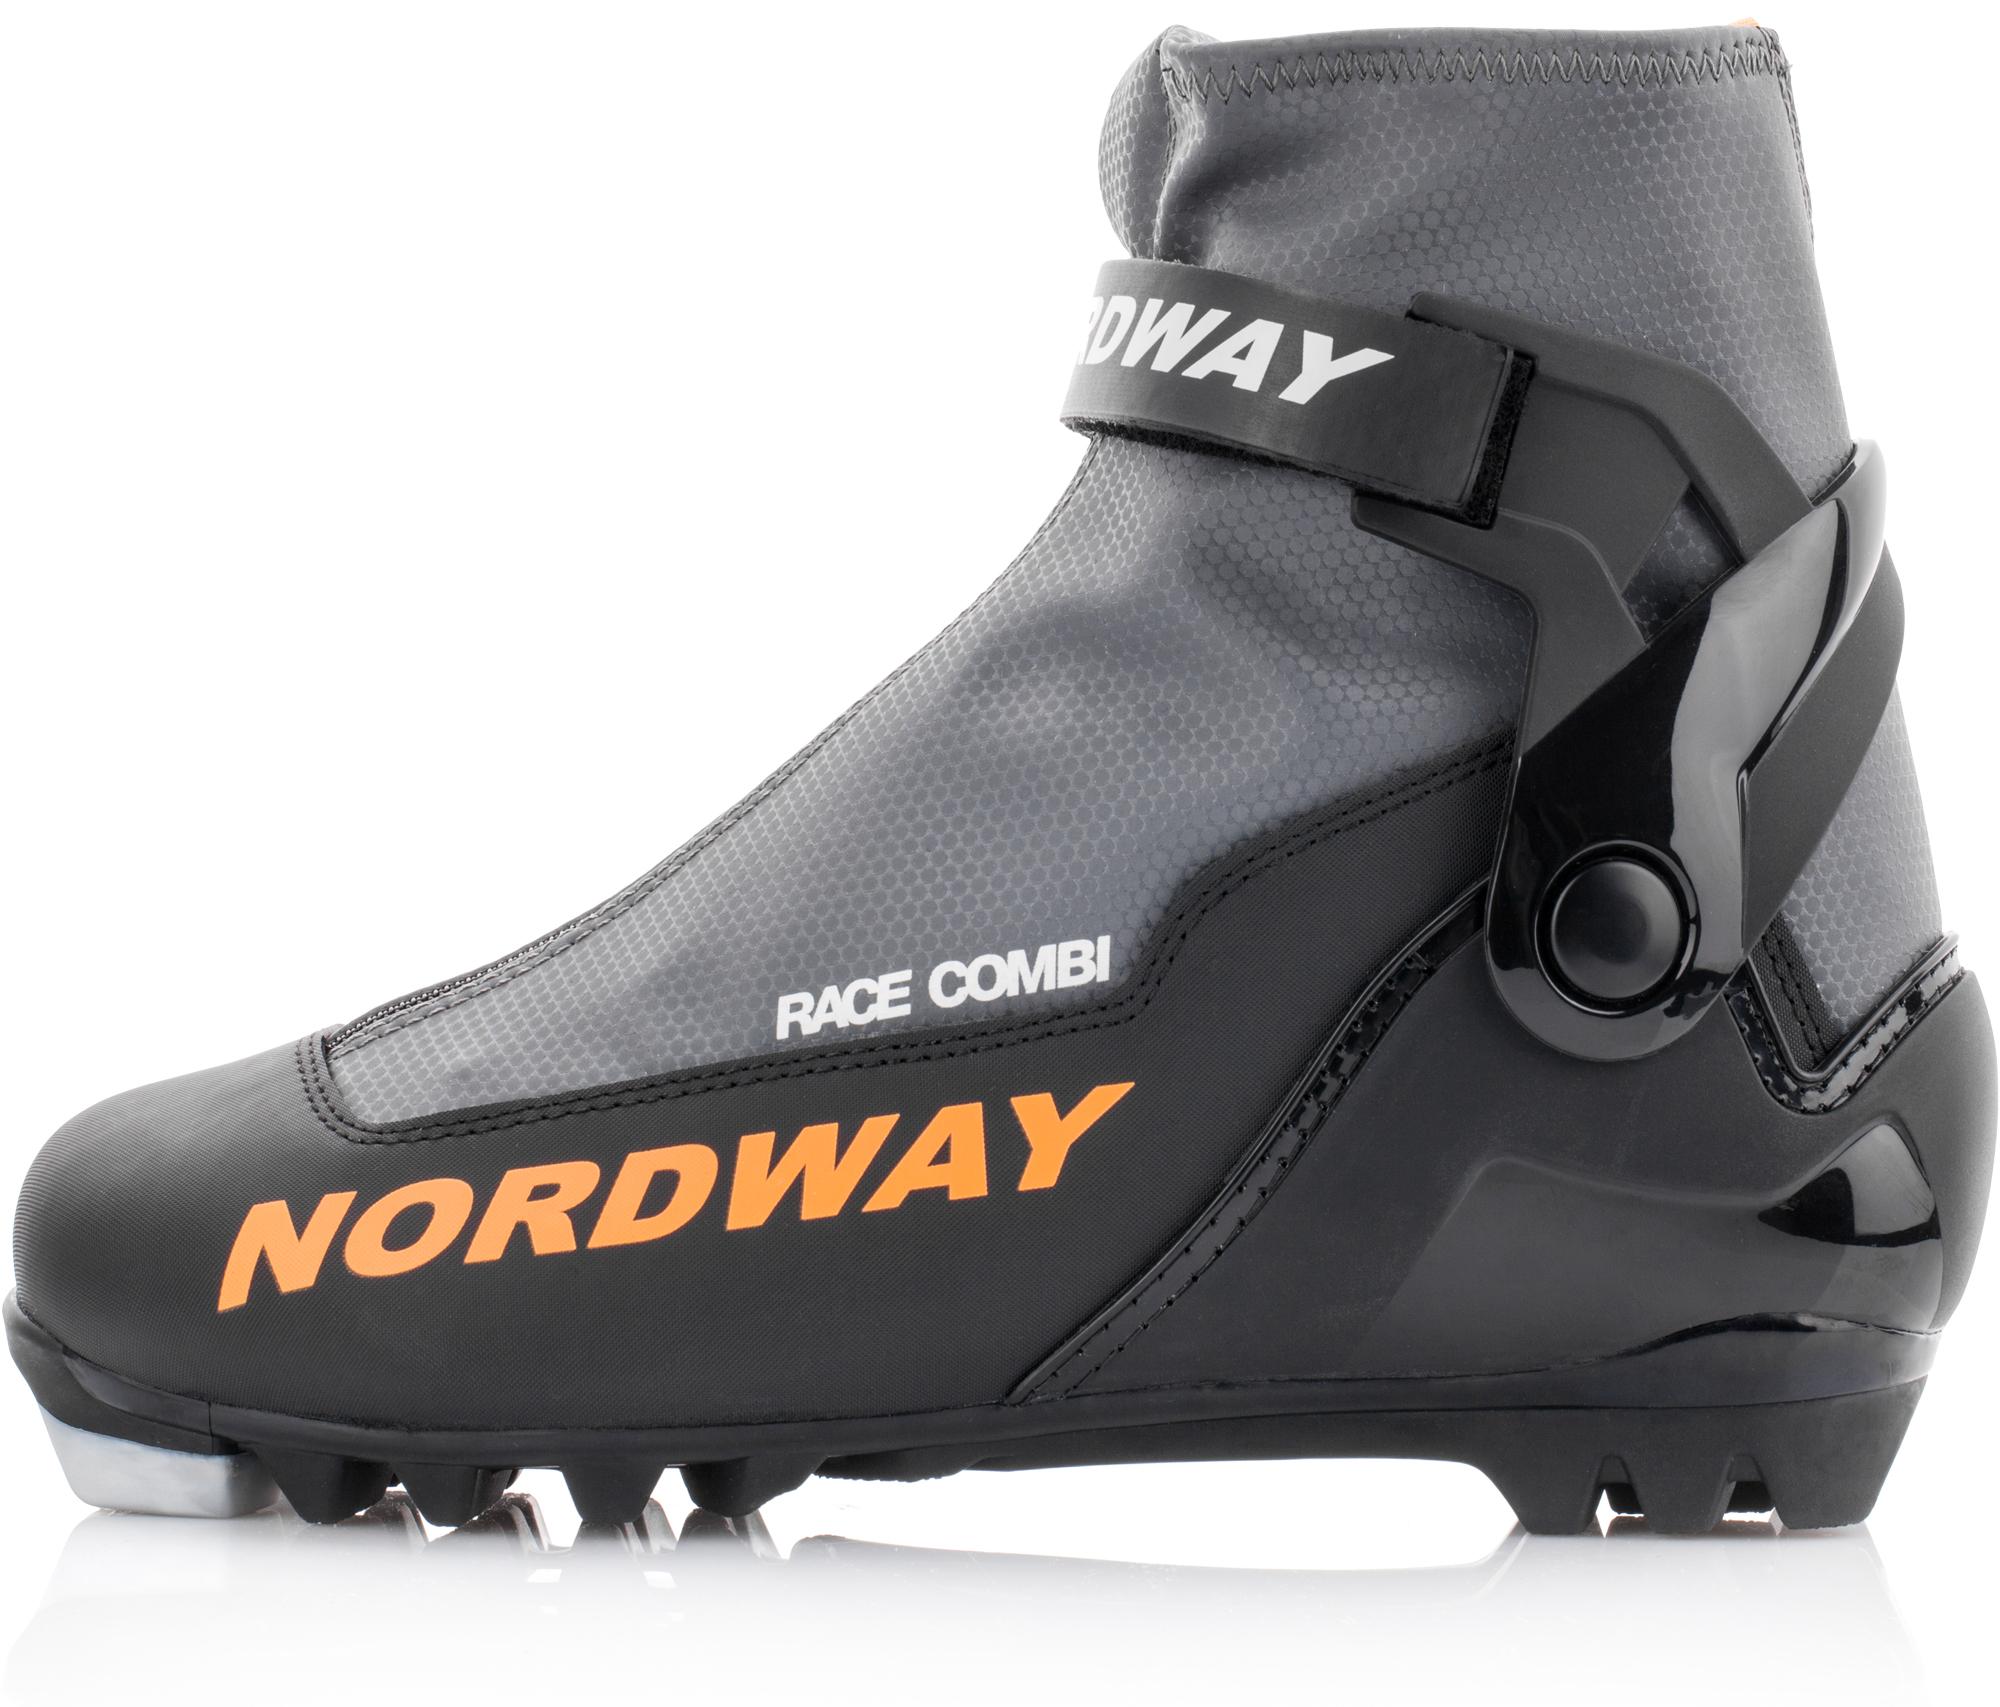 Nordway Ботинки для беговых лыж Nordway Race Combi